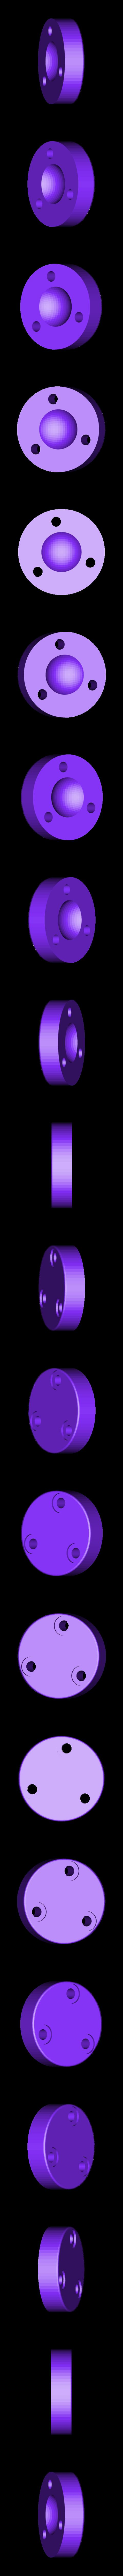 T_Rex_Body_part.stl Download STL file T-rex Robot • Template to 3D print, 3d-fabric-jean-pierre